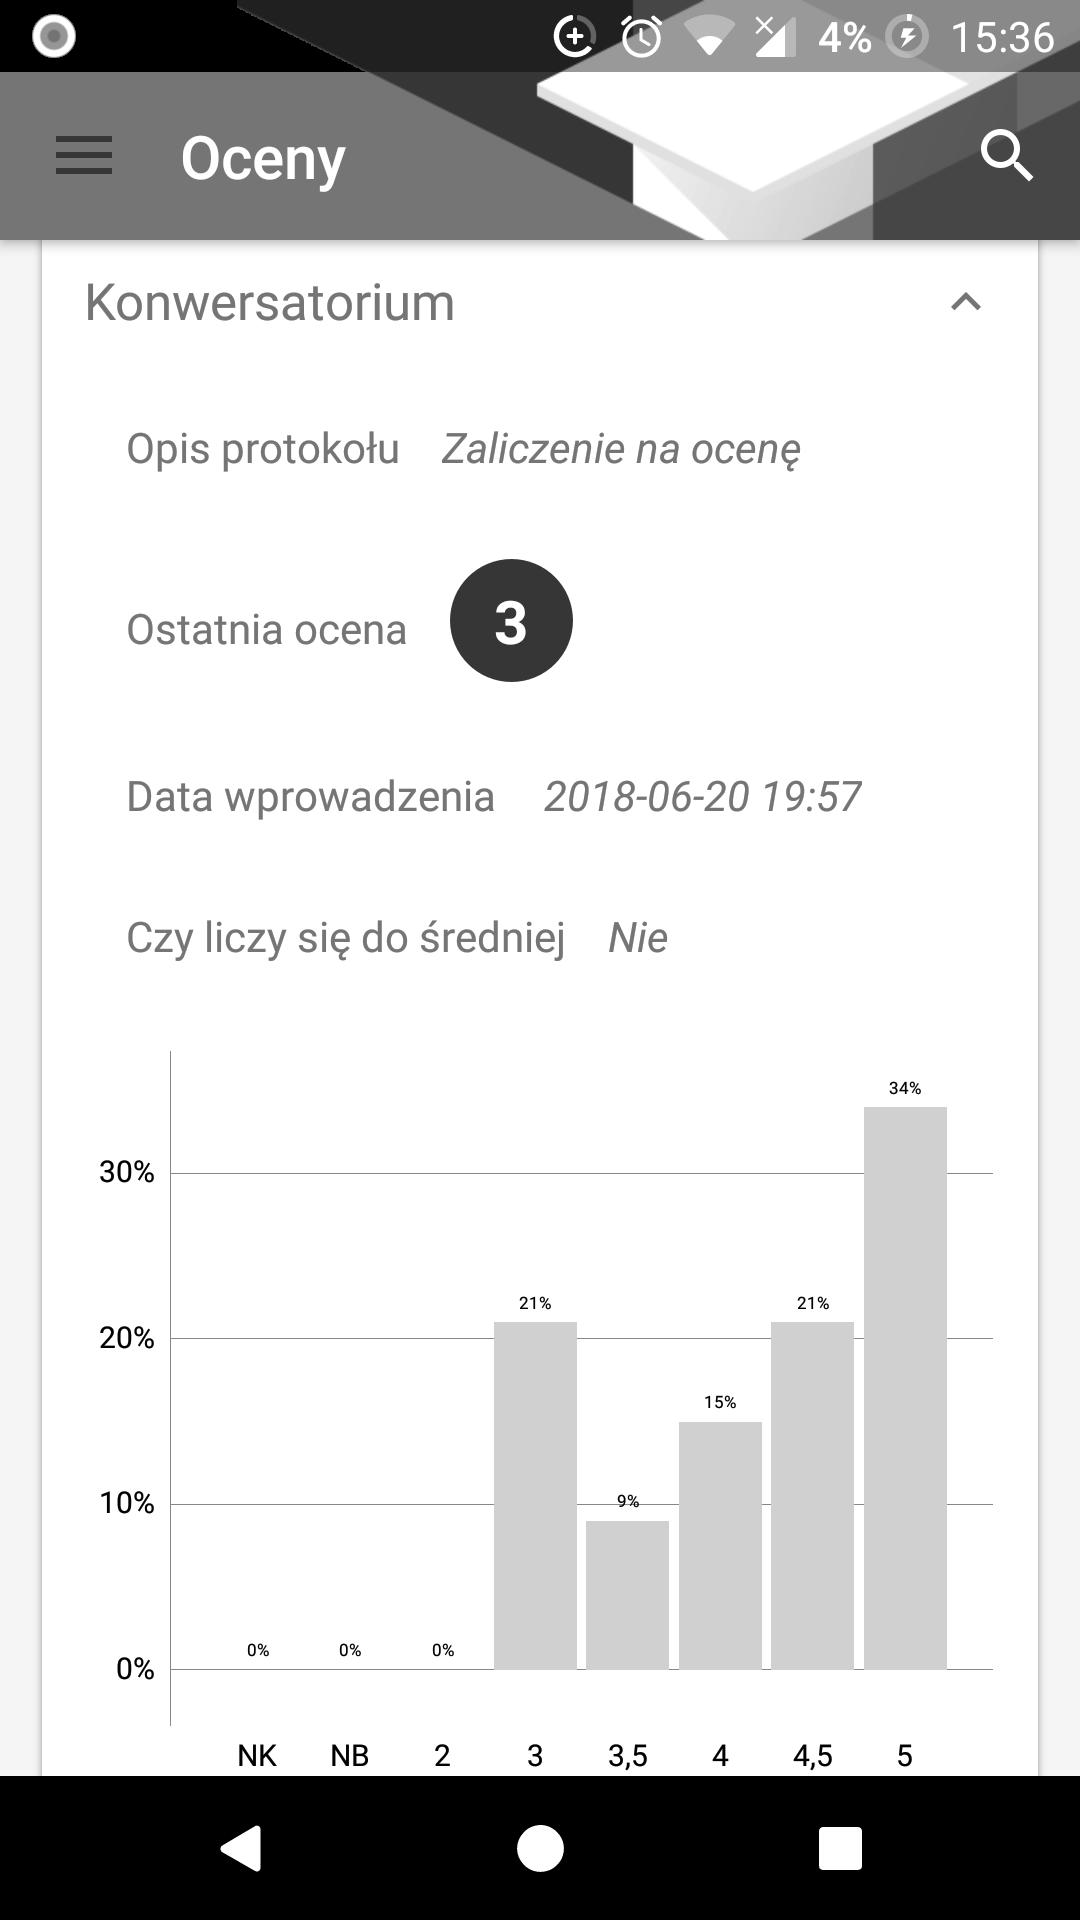 Screenshot (7 sty 2019 15_36_36).png